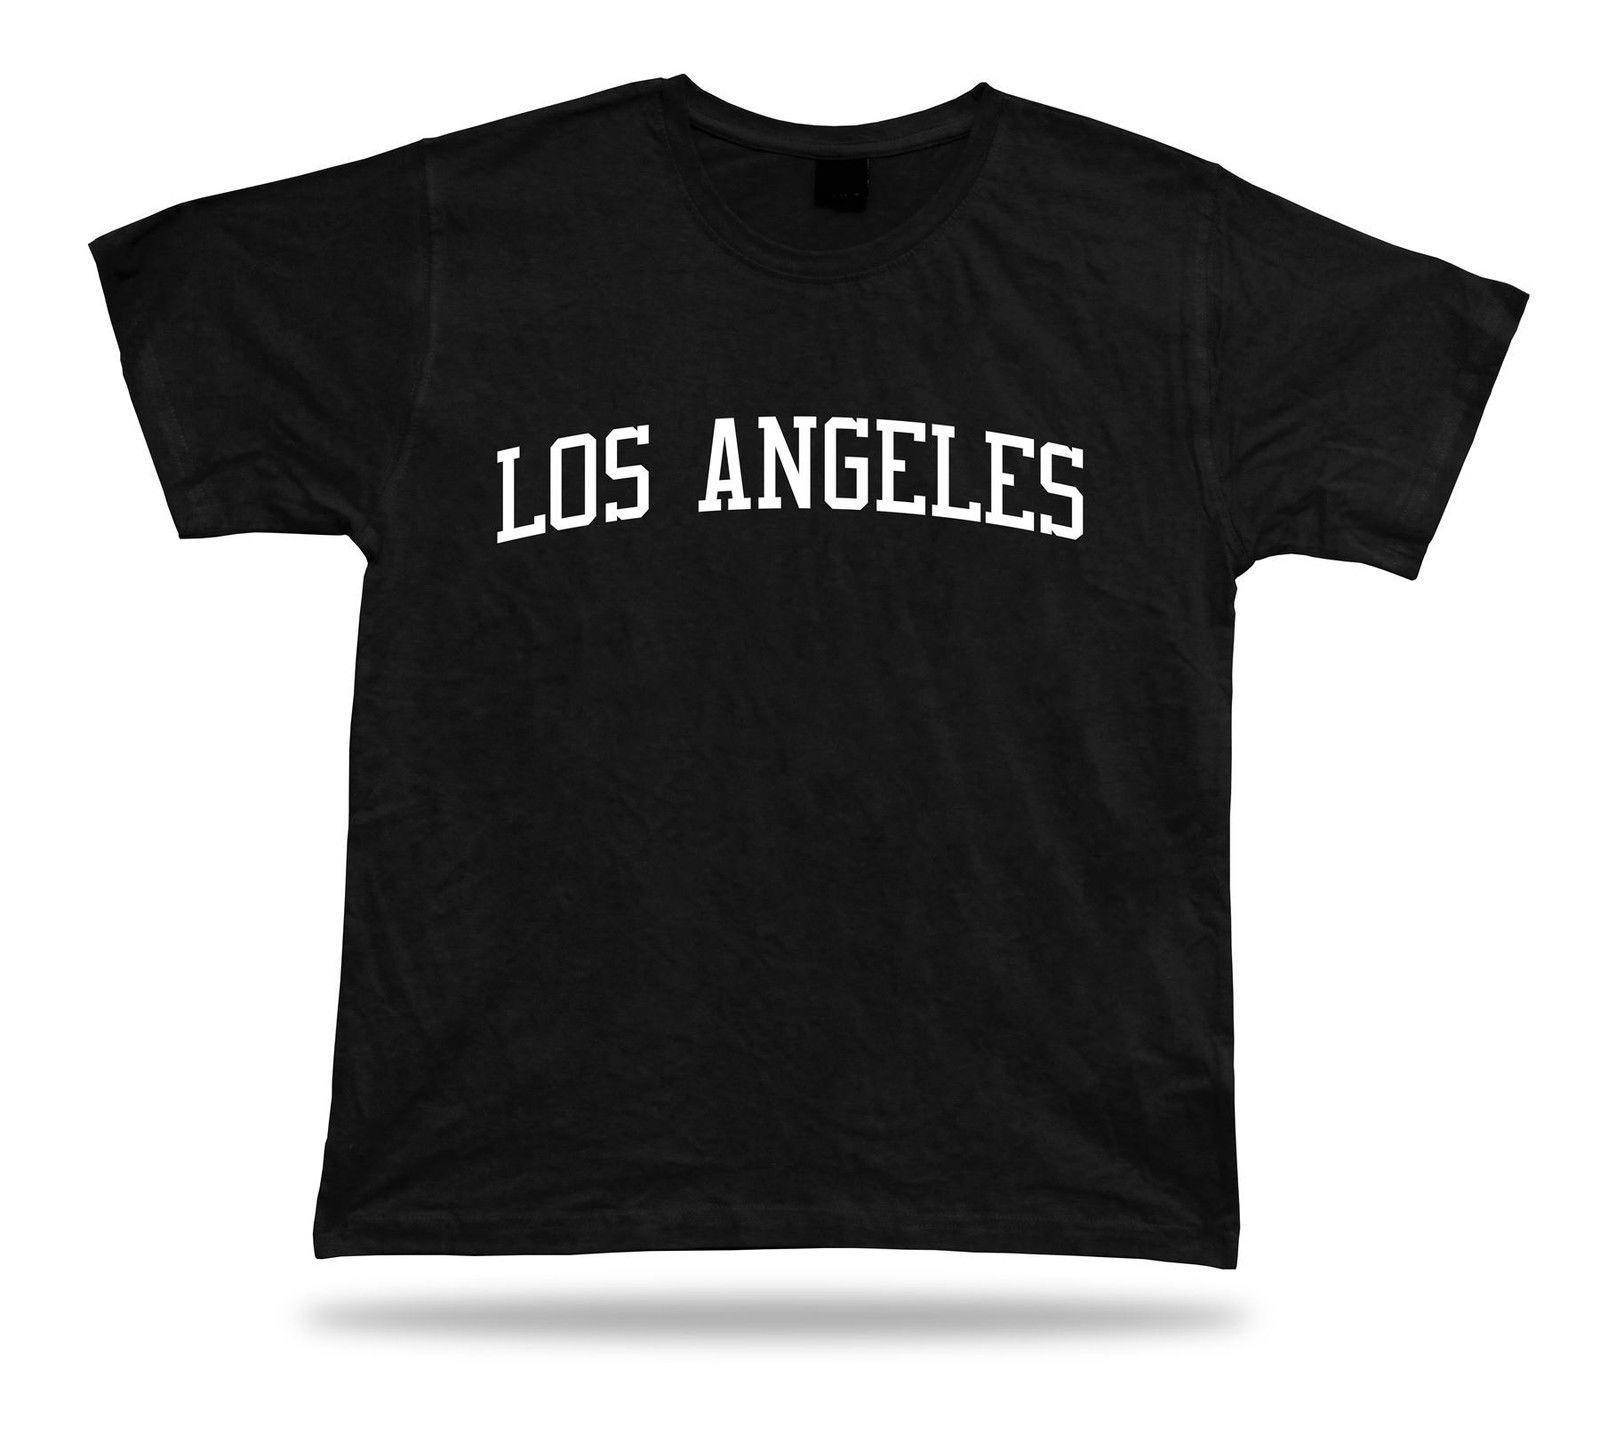 T-Shirt Stylish Classic Apparel ottima idea regalo California City Tee Los Angeles